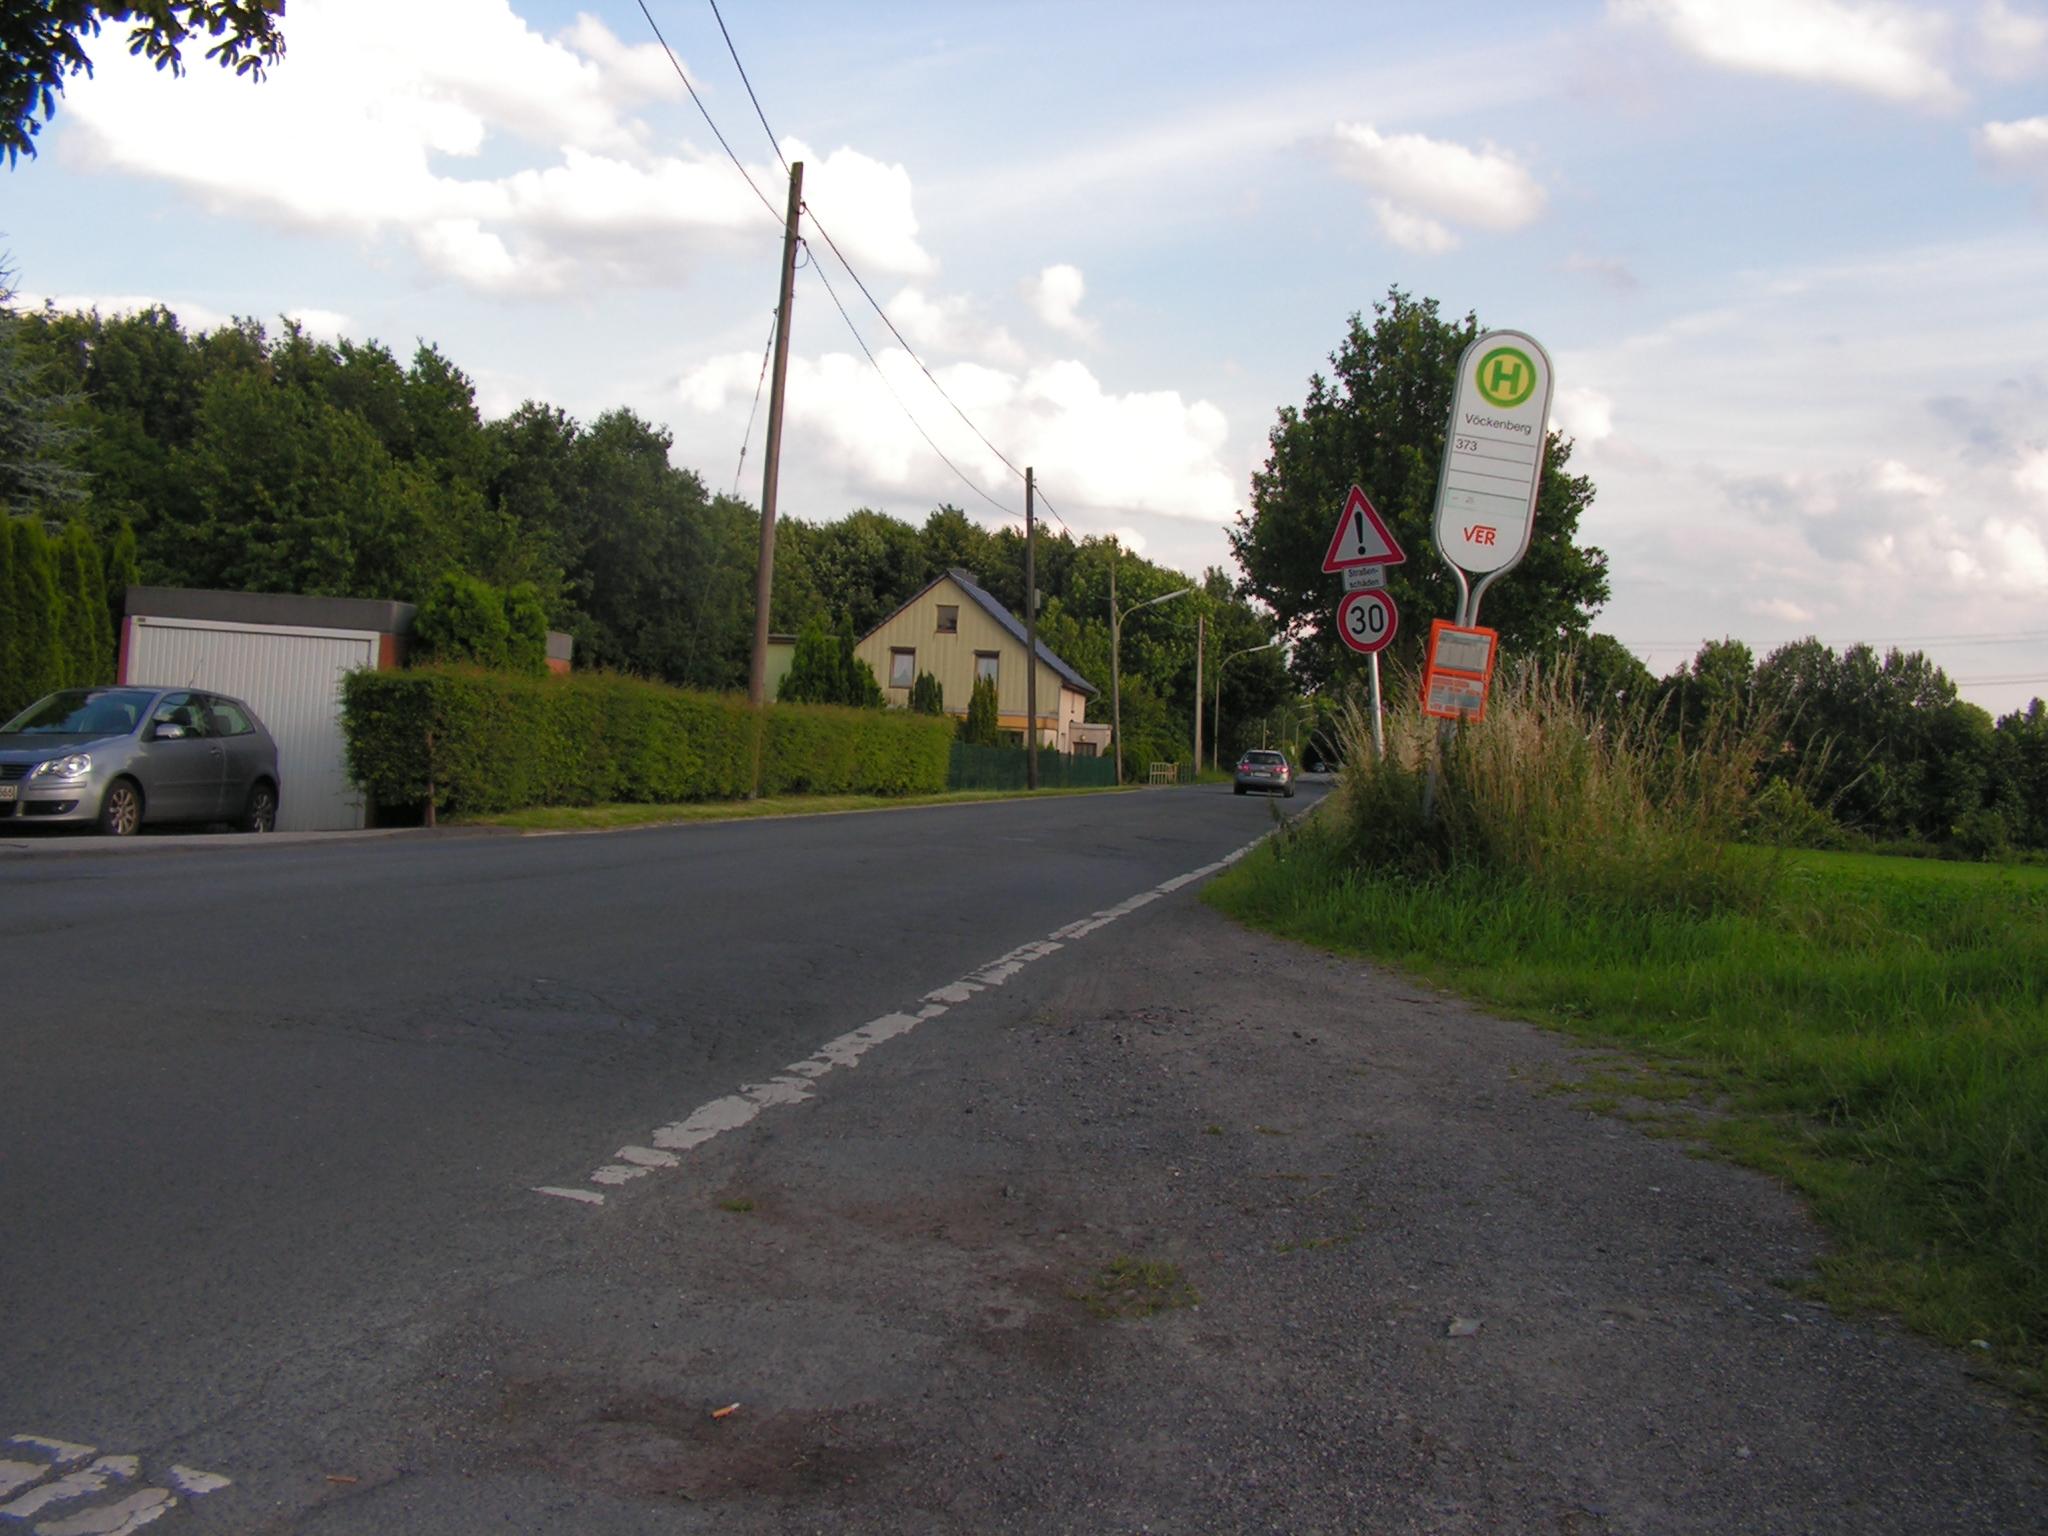 Verkehrsberuhigung in Witten. (Foto: Peter Maier)